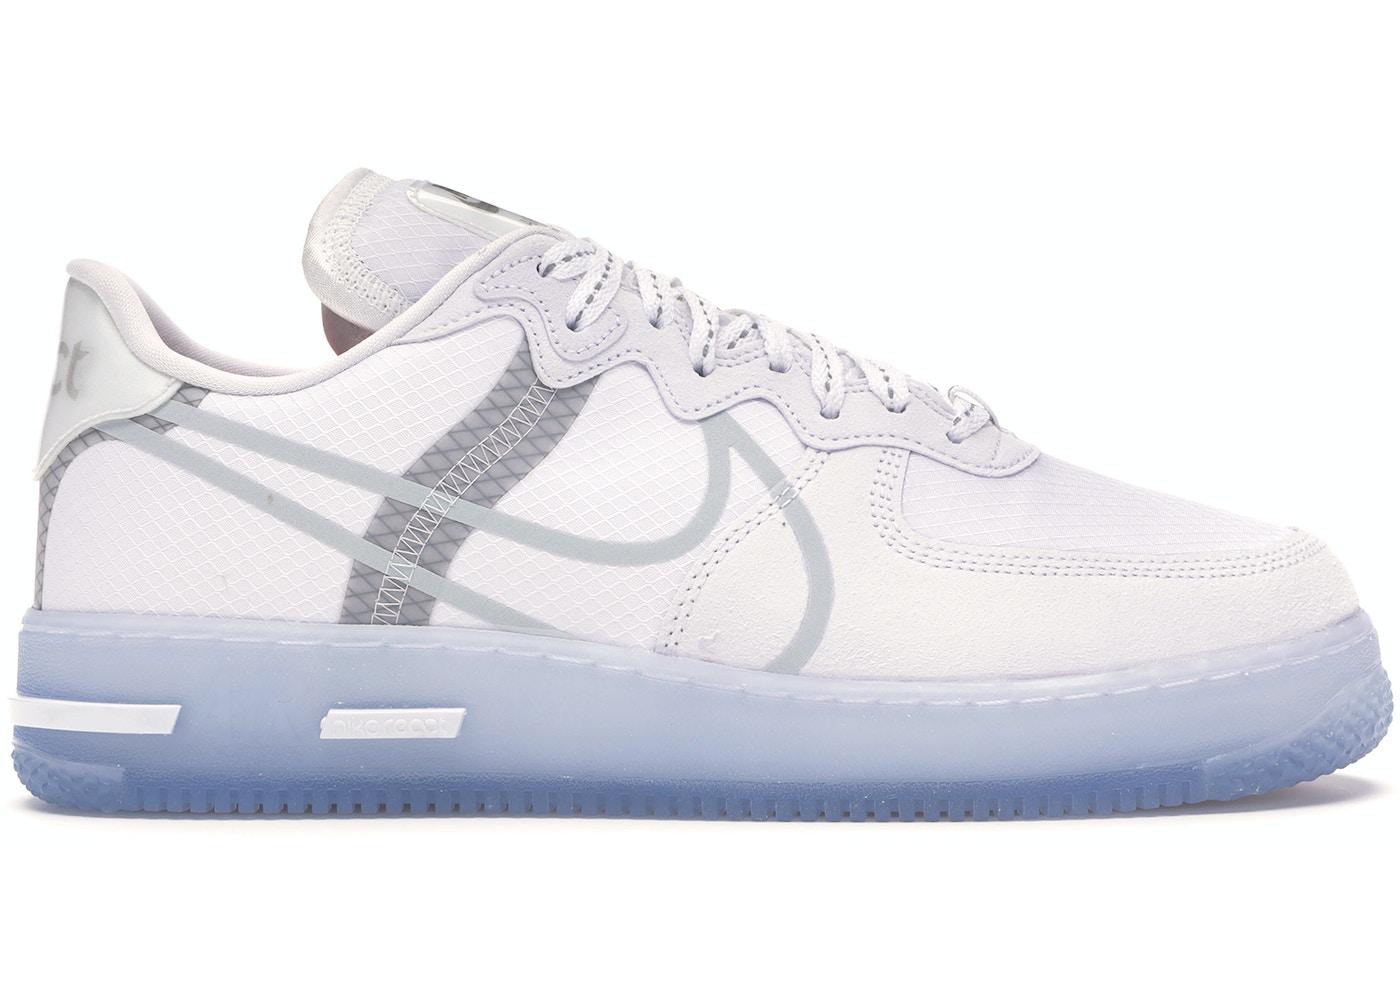 Nike Air Force 1 React White Light Bone Cq8879 100